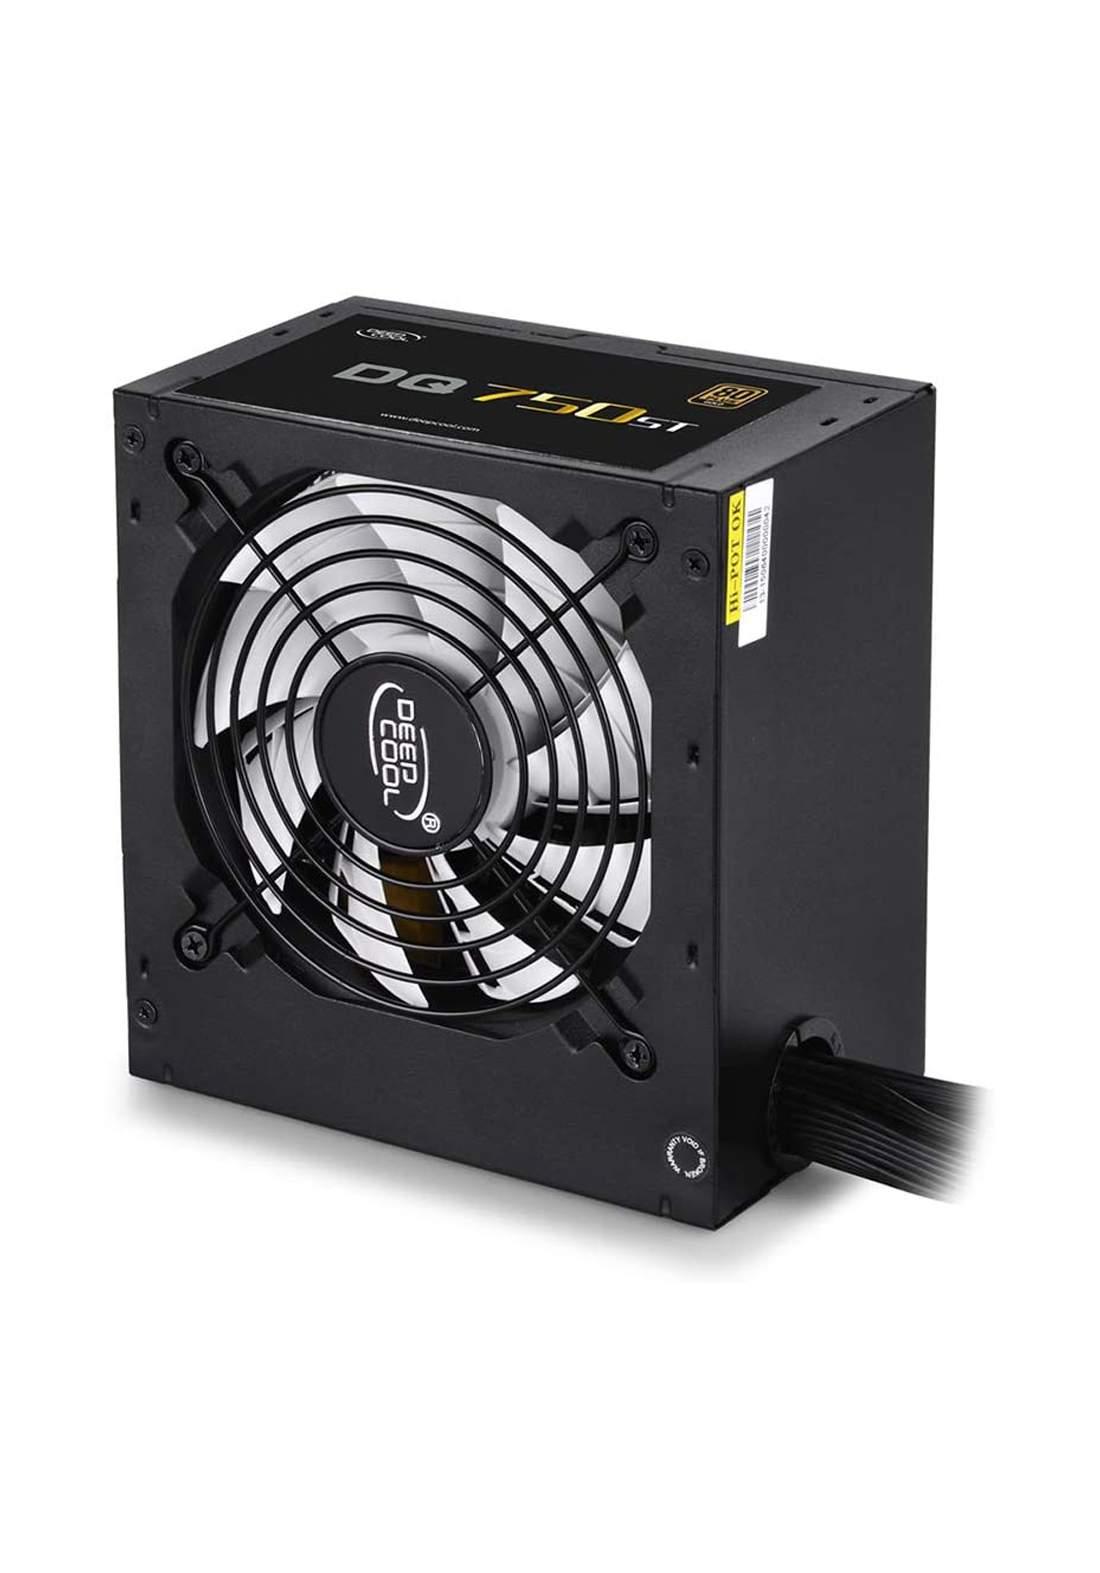 Deepcool DQ750ST 80 Plus Gold  Power Supply - Black  مجهز قدرة